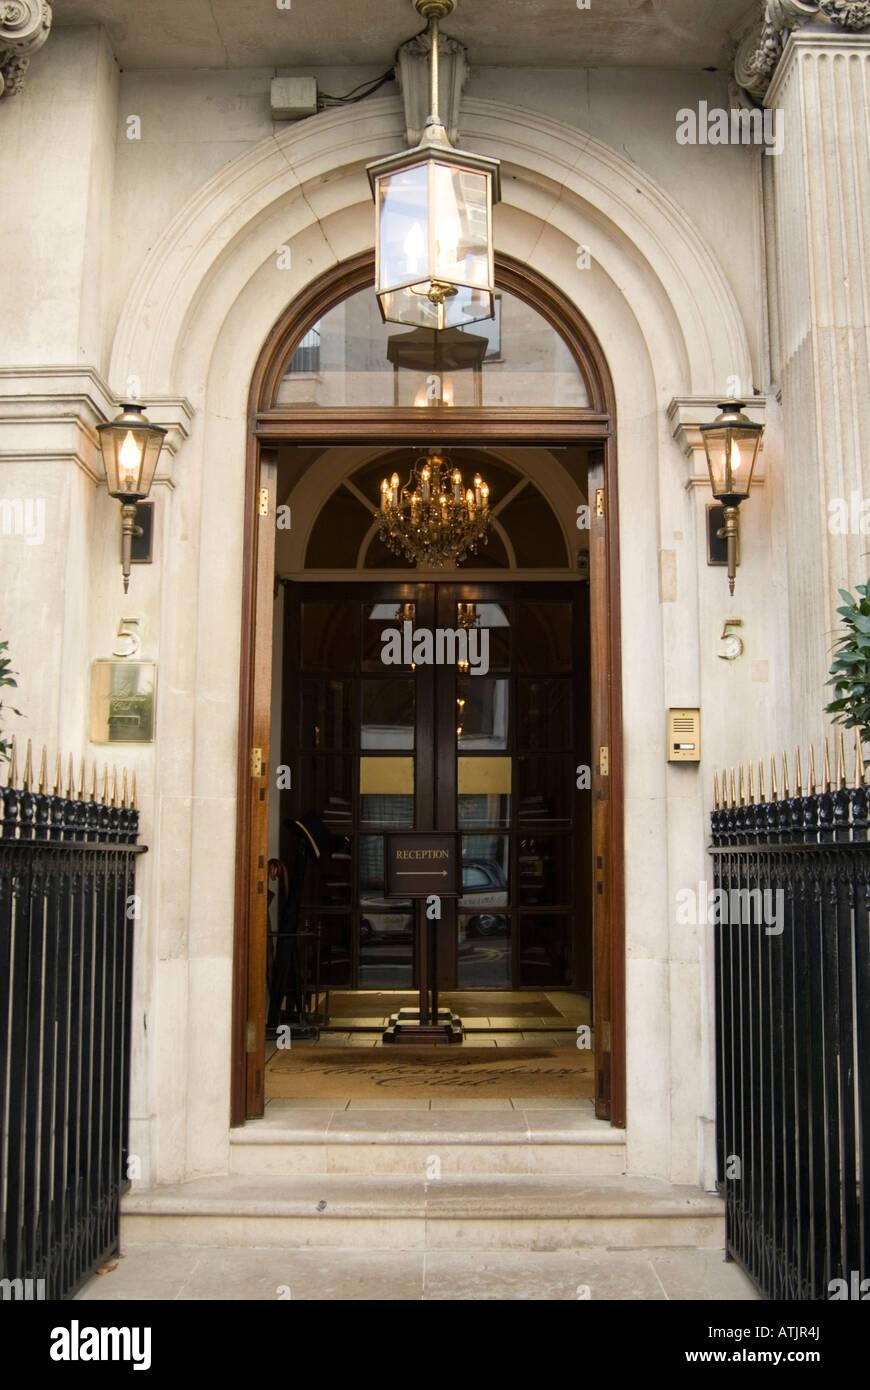 Les Ambassadeurs Club in Mayfair, London England UK - Stock Image